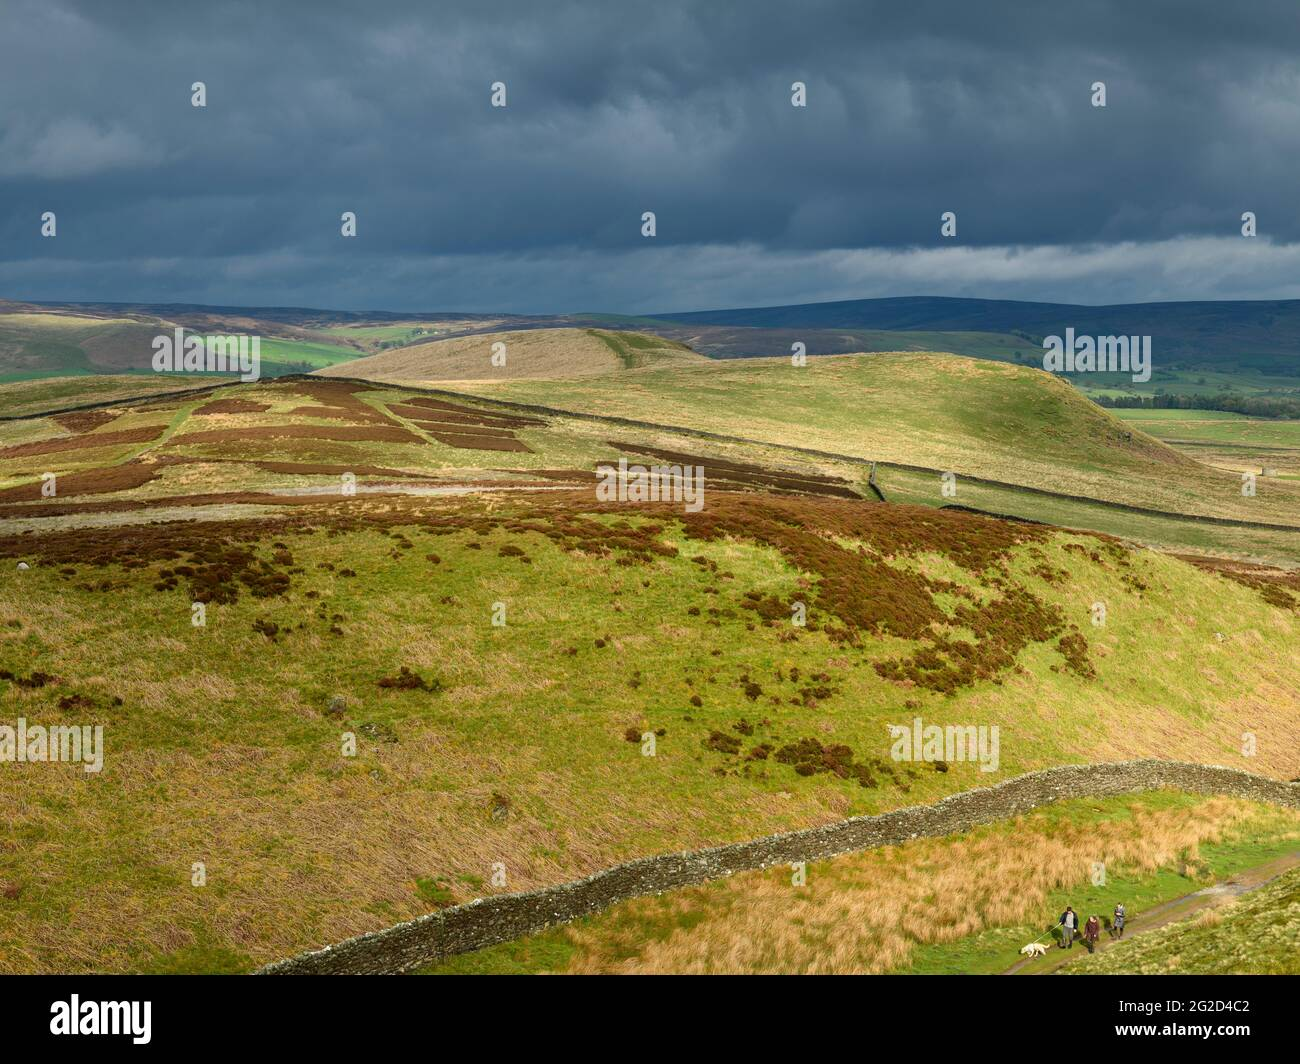 Paisaje rural escénico y nubes de lluvia oscura (zona montañosa, colinas onduladas, personas que caminan perro mascota) - vista a Wharfedale, Yorkshire Dales Inglaterra, Reino Unido Foto de stock